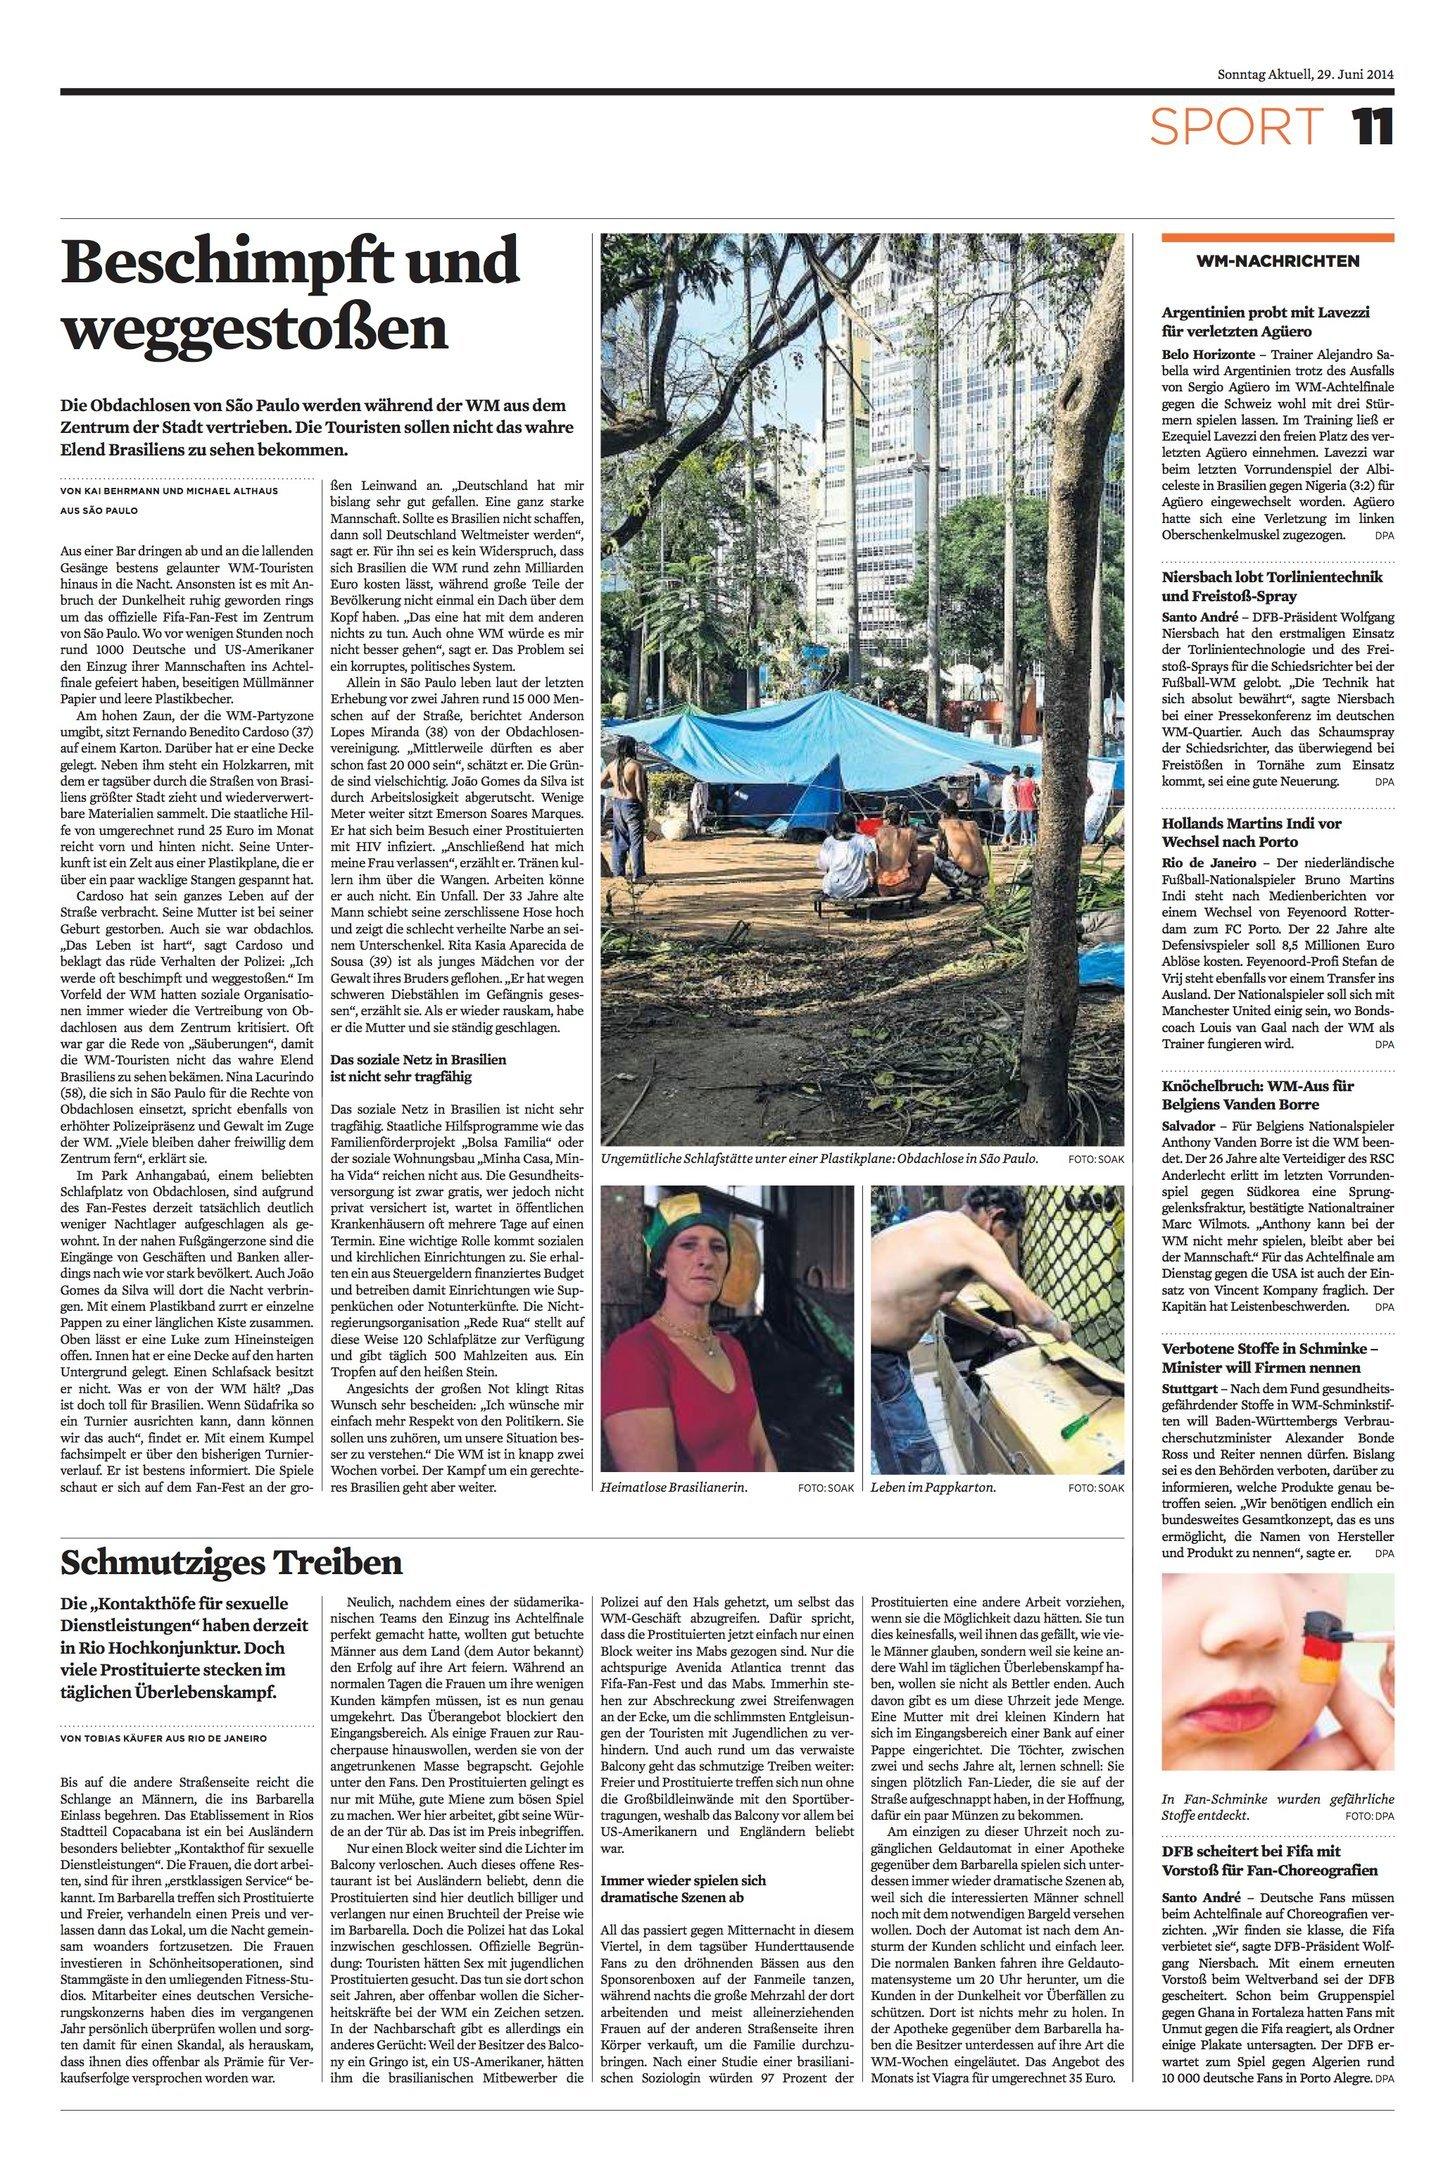 20140629-Stuttgarter-Nachrichten.jpg